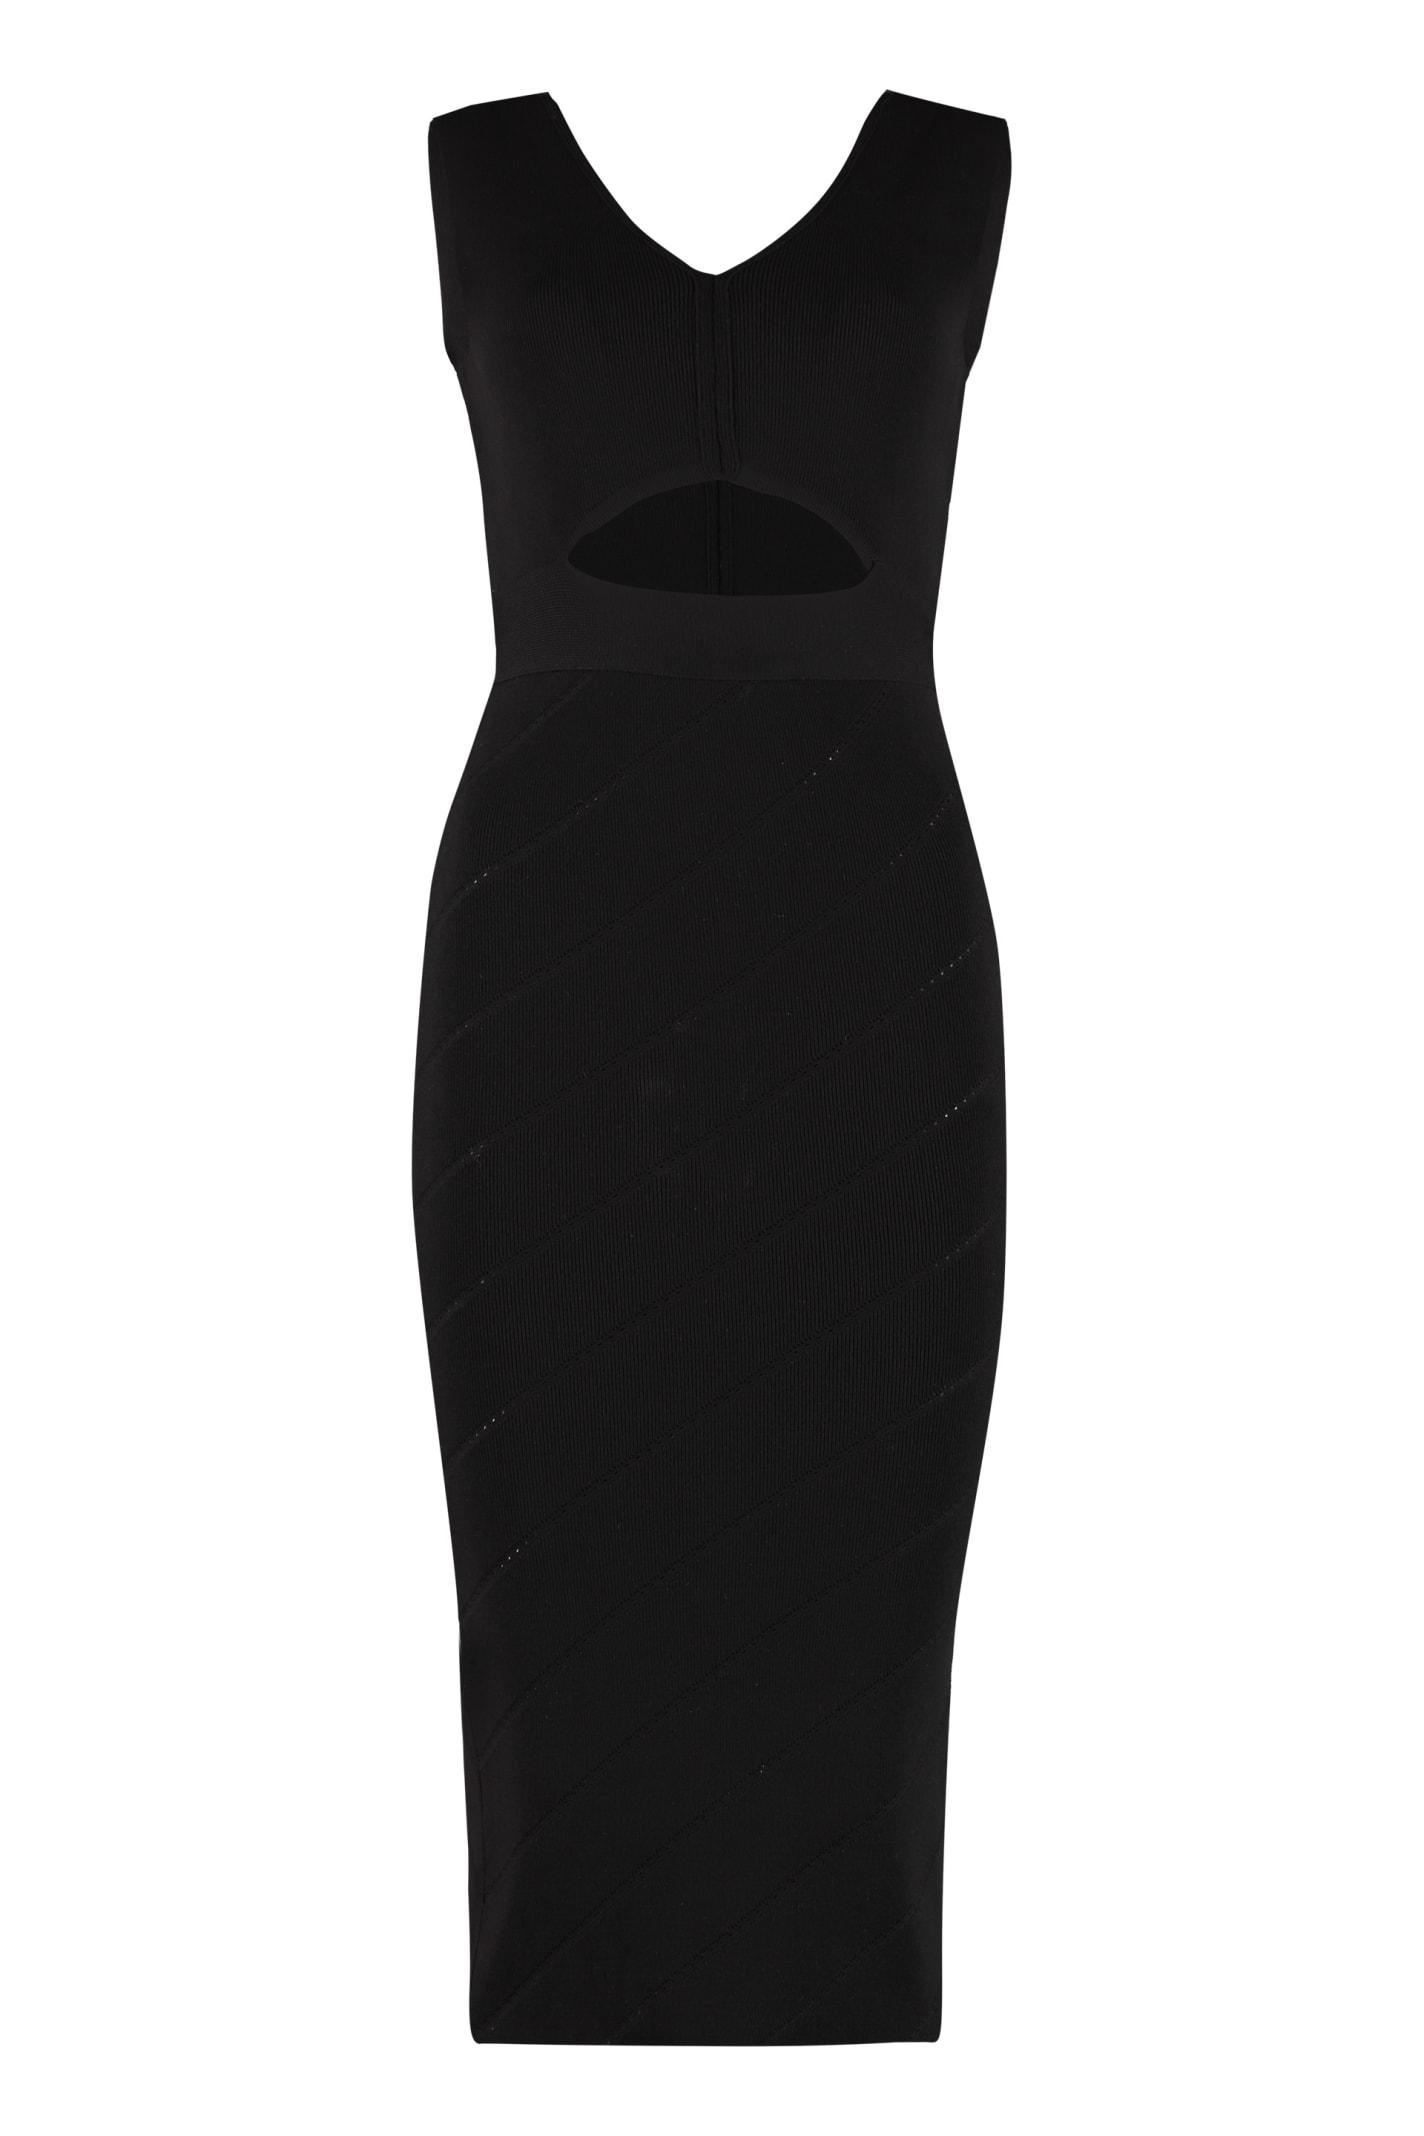 Buy Pinko Nauru Knitted Sheath Dress online, shop Pinko with free shipping